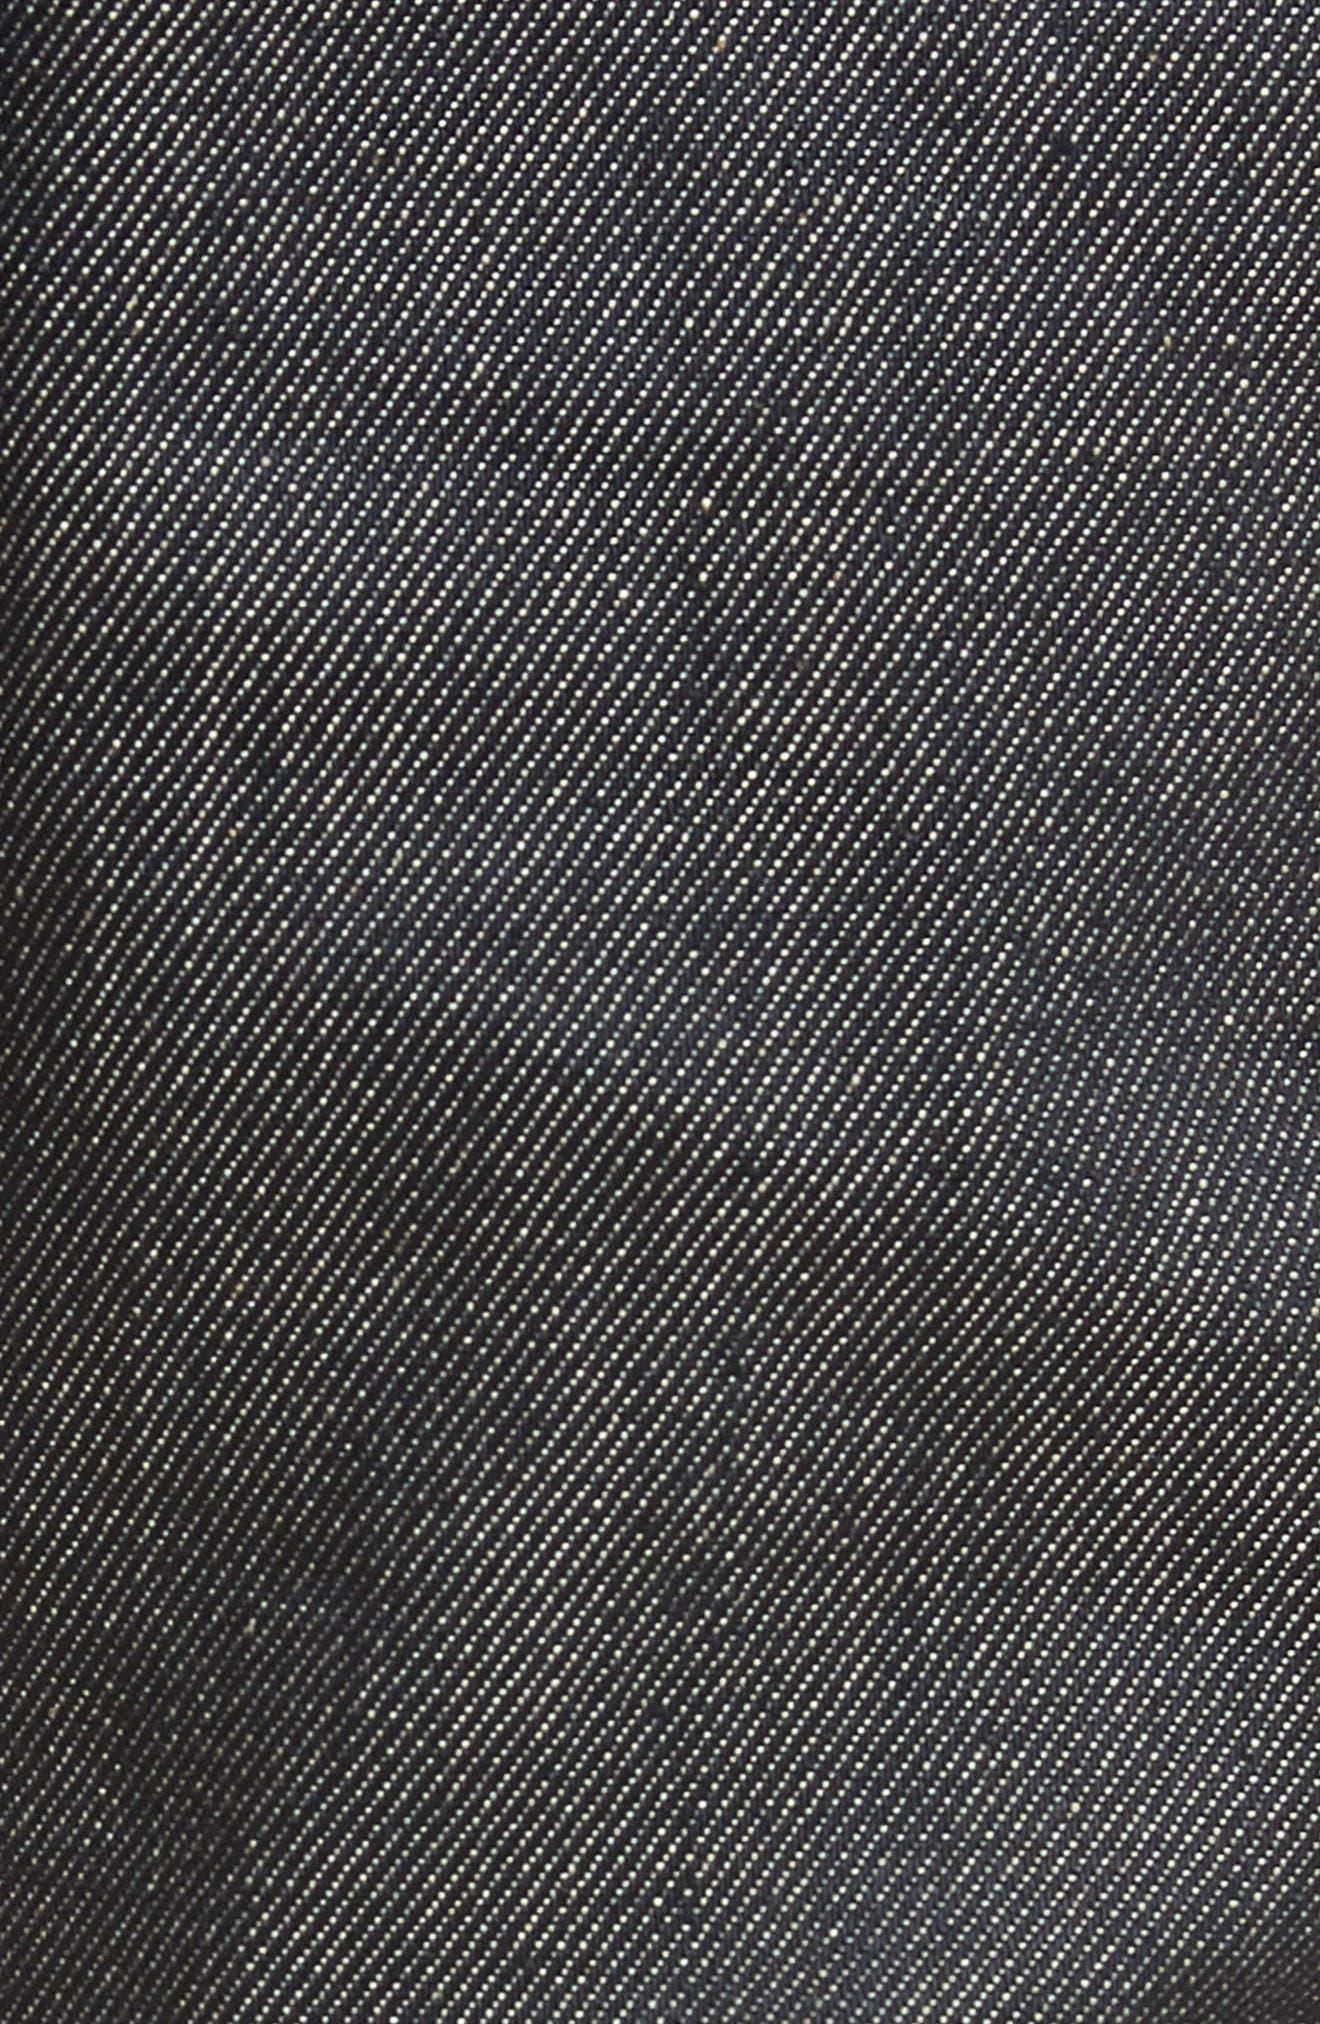 Torino Slim Fit Jeans,                             Alternate thumbnail 5, color,                             Richmond